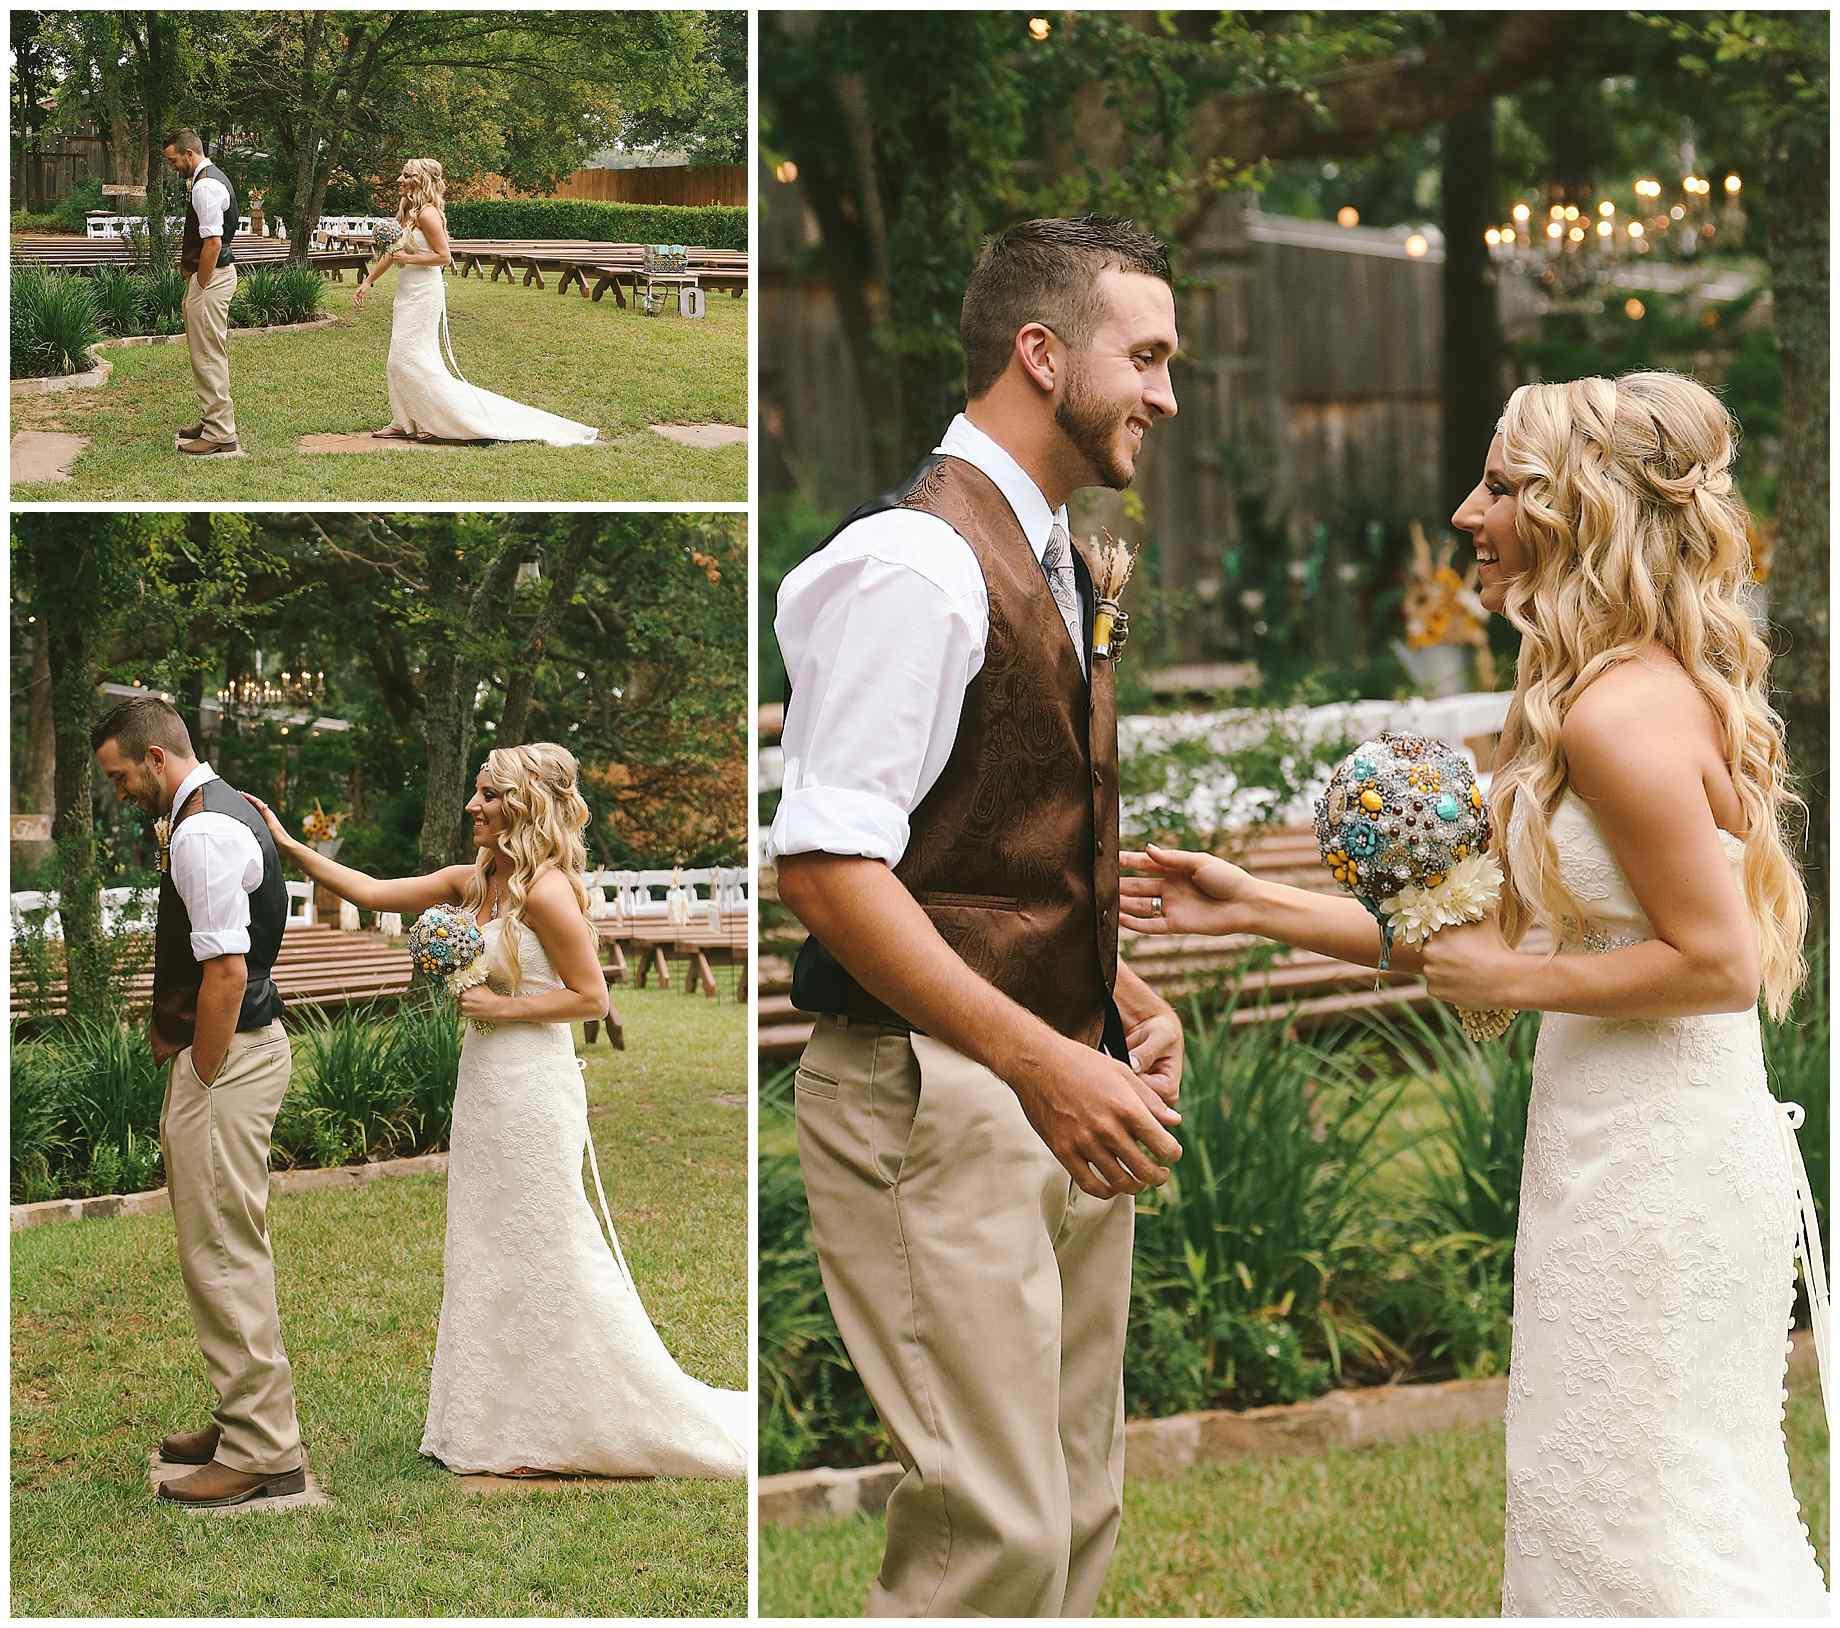 stone-oak-ranch-outdoor-wedding-007